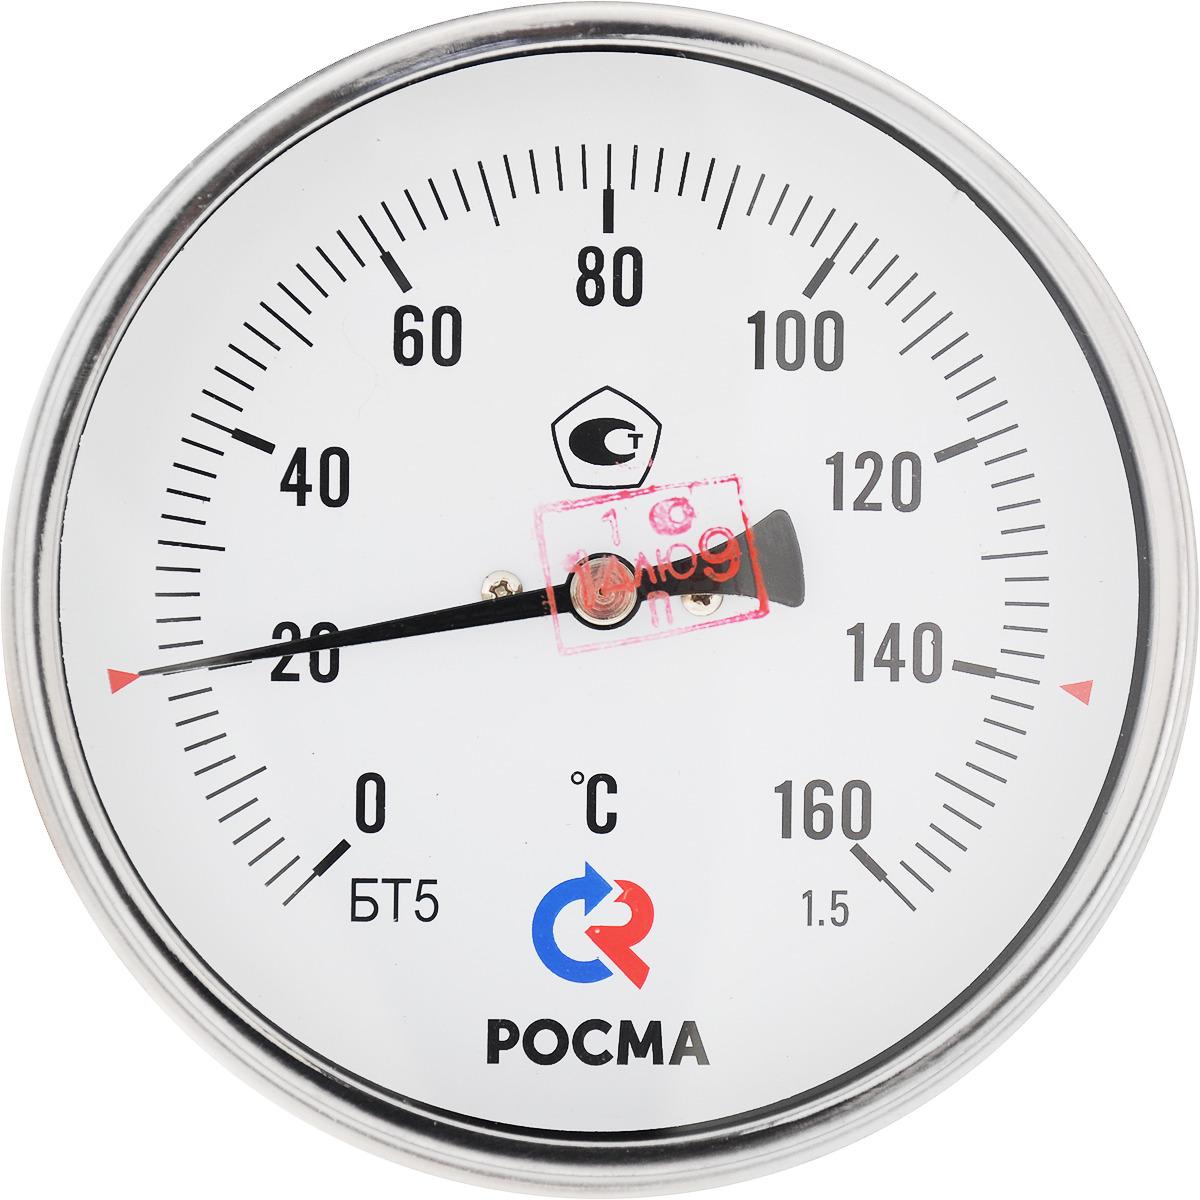 Термометр сантехнический Valtec БT-51 Дy 100 с задним подключением, 1/2 0-160* термометр сантехнический valtec бt 30 dy63 накладной 0 150